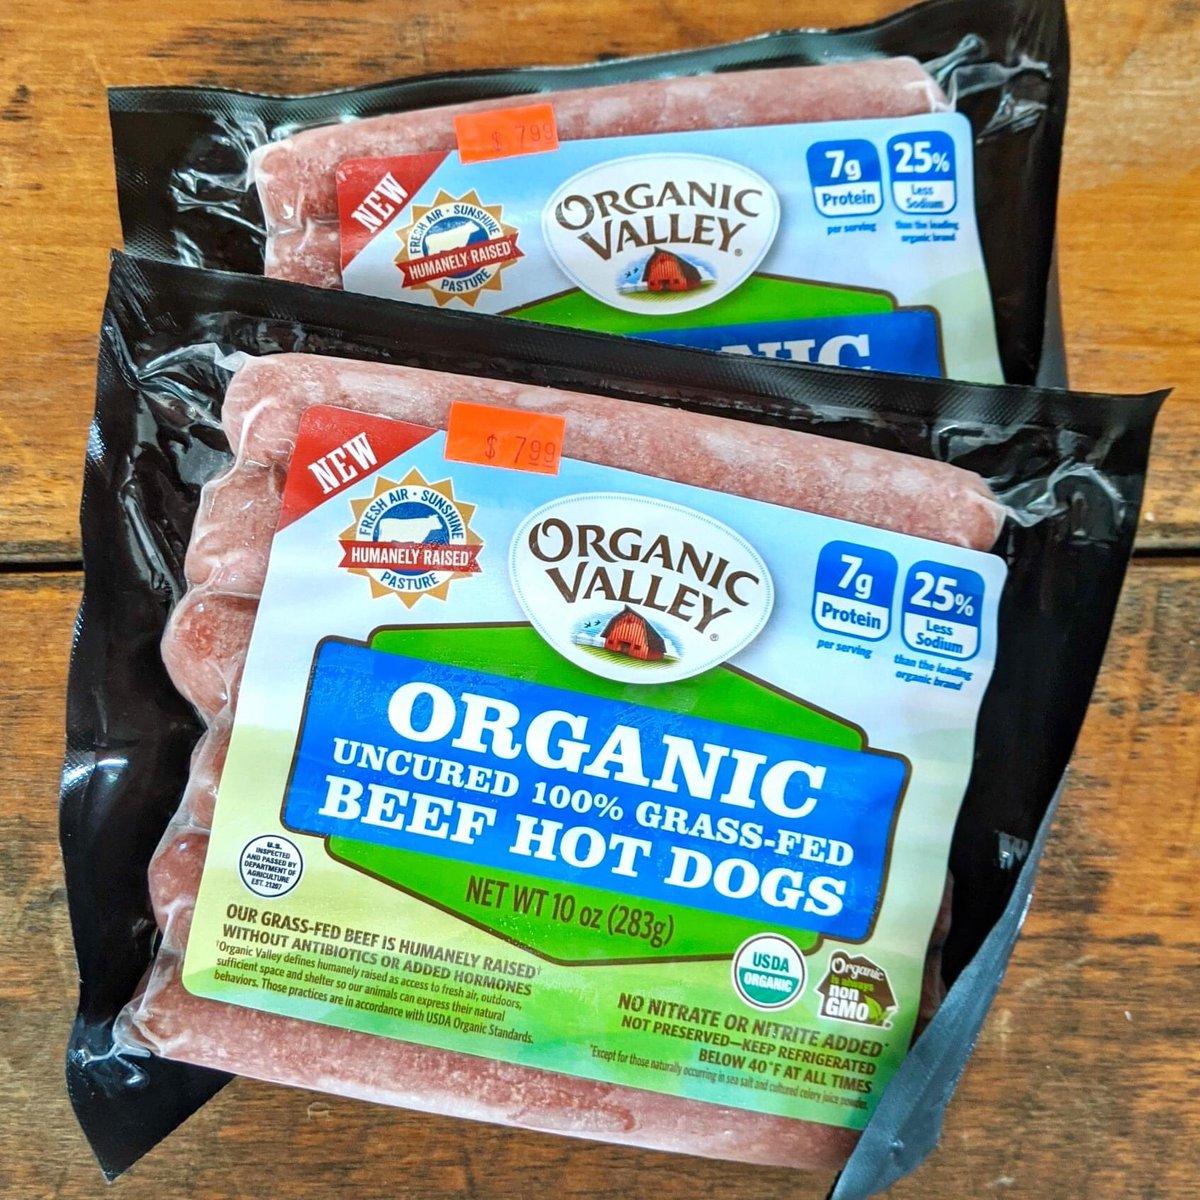 Hot dogs aren't just for summer! We now carry Organic Valley grass-fed organic beef hot dogs - great taste in a healthier hot dog. #organic #hotdogs #grassfed #lambertvillenj #newhopepa #doylestownpa #HunterdonCountyNJ https://t.co/qtByLGtram